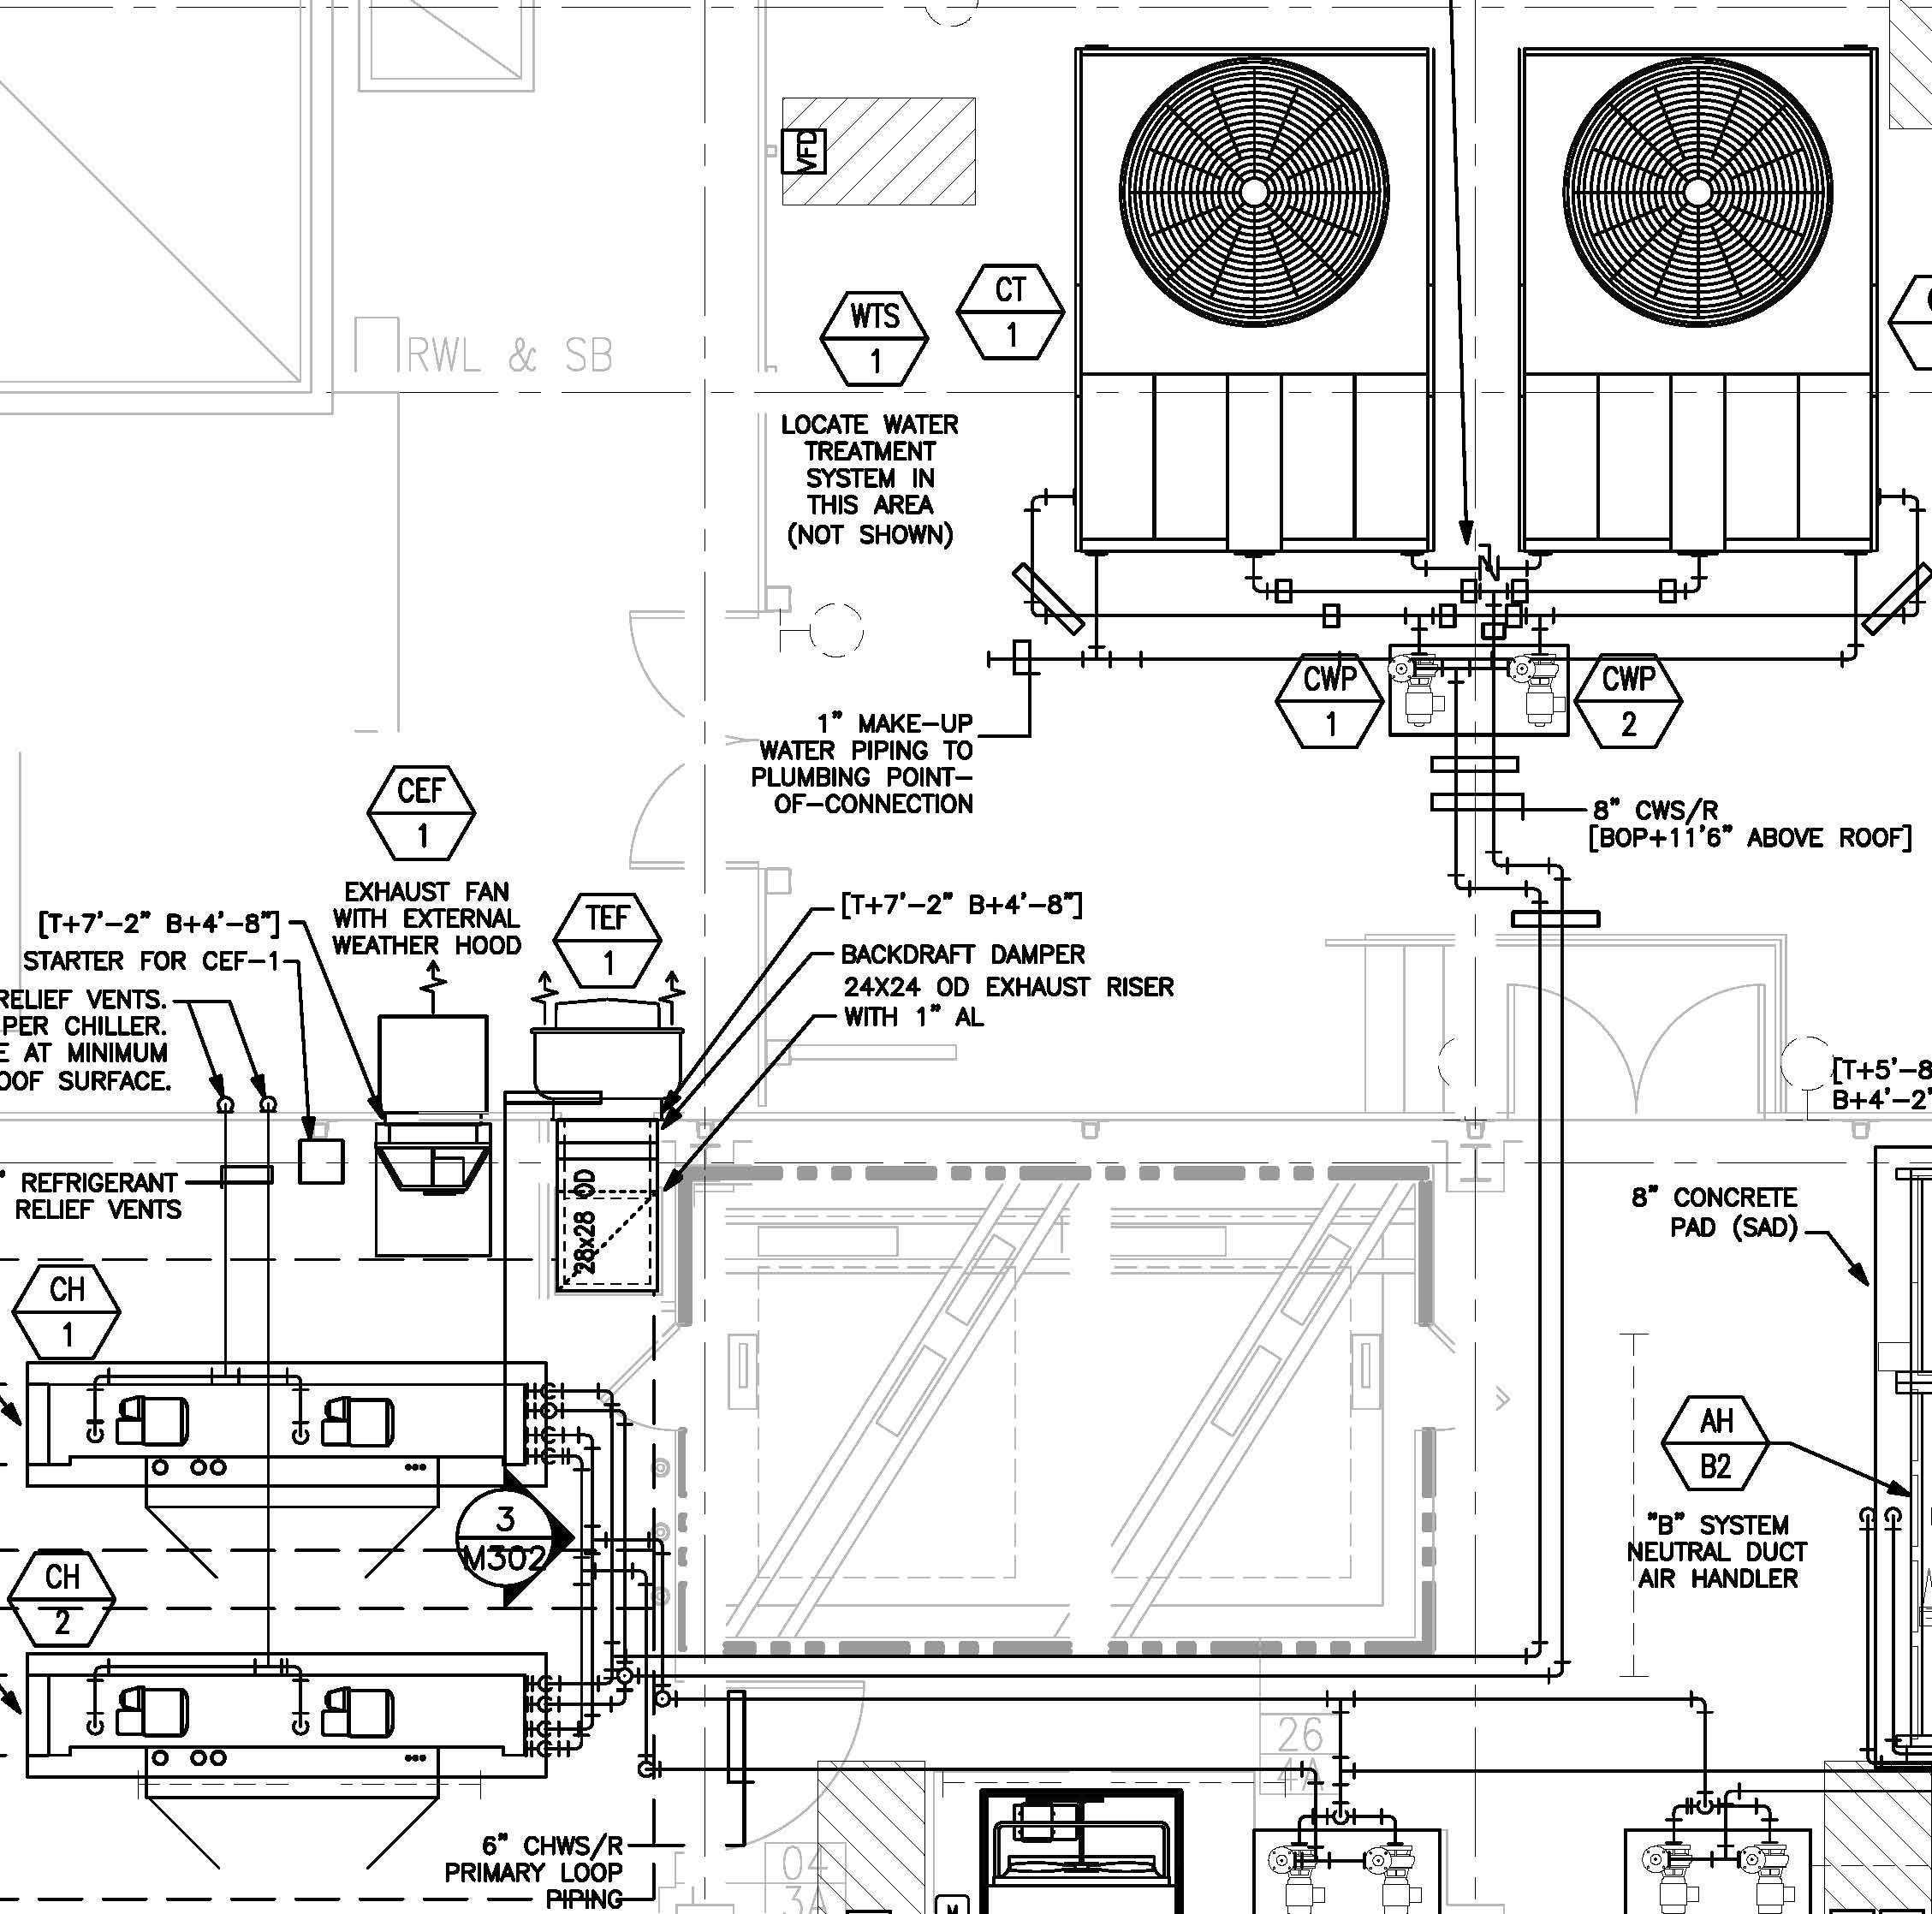 Bus Air Brake System Diagram Truck Air System Diagram Truck Air System Diagram Well Pump House Of Bus Air Brake System Diagram